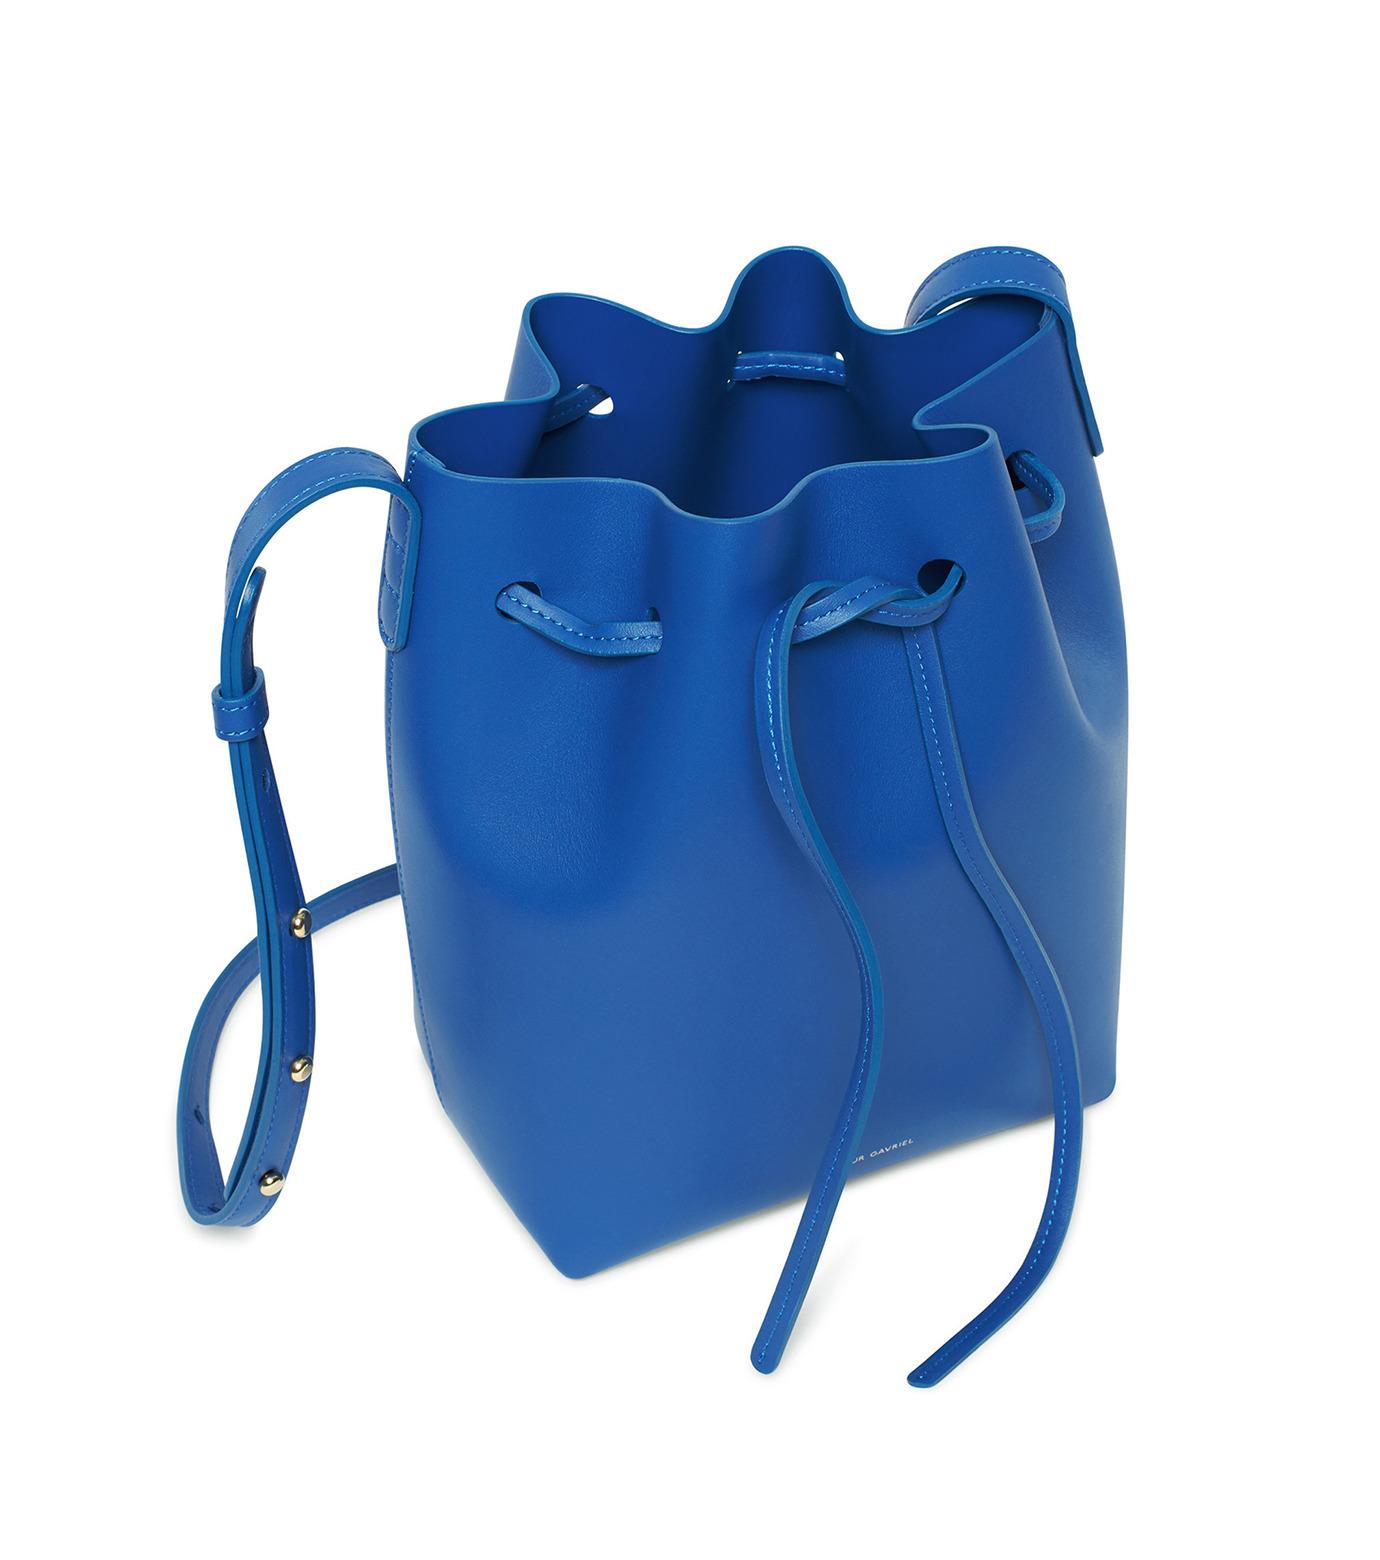 Mansur Gavriel(マンサーガブリエル)のMini Bucket Bag-BLUE(バッグ/bag)-HMB004CA-92 拡大詳細画像3